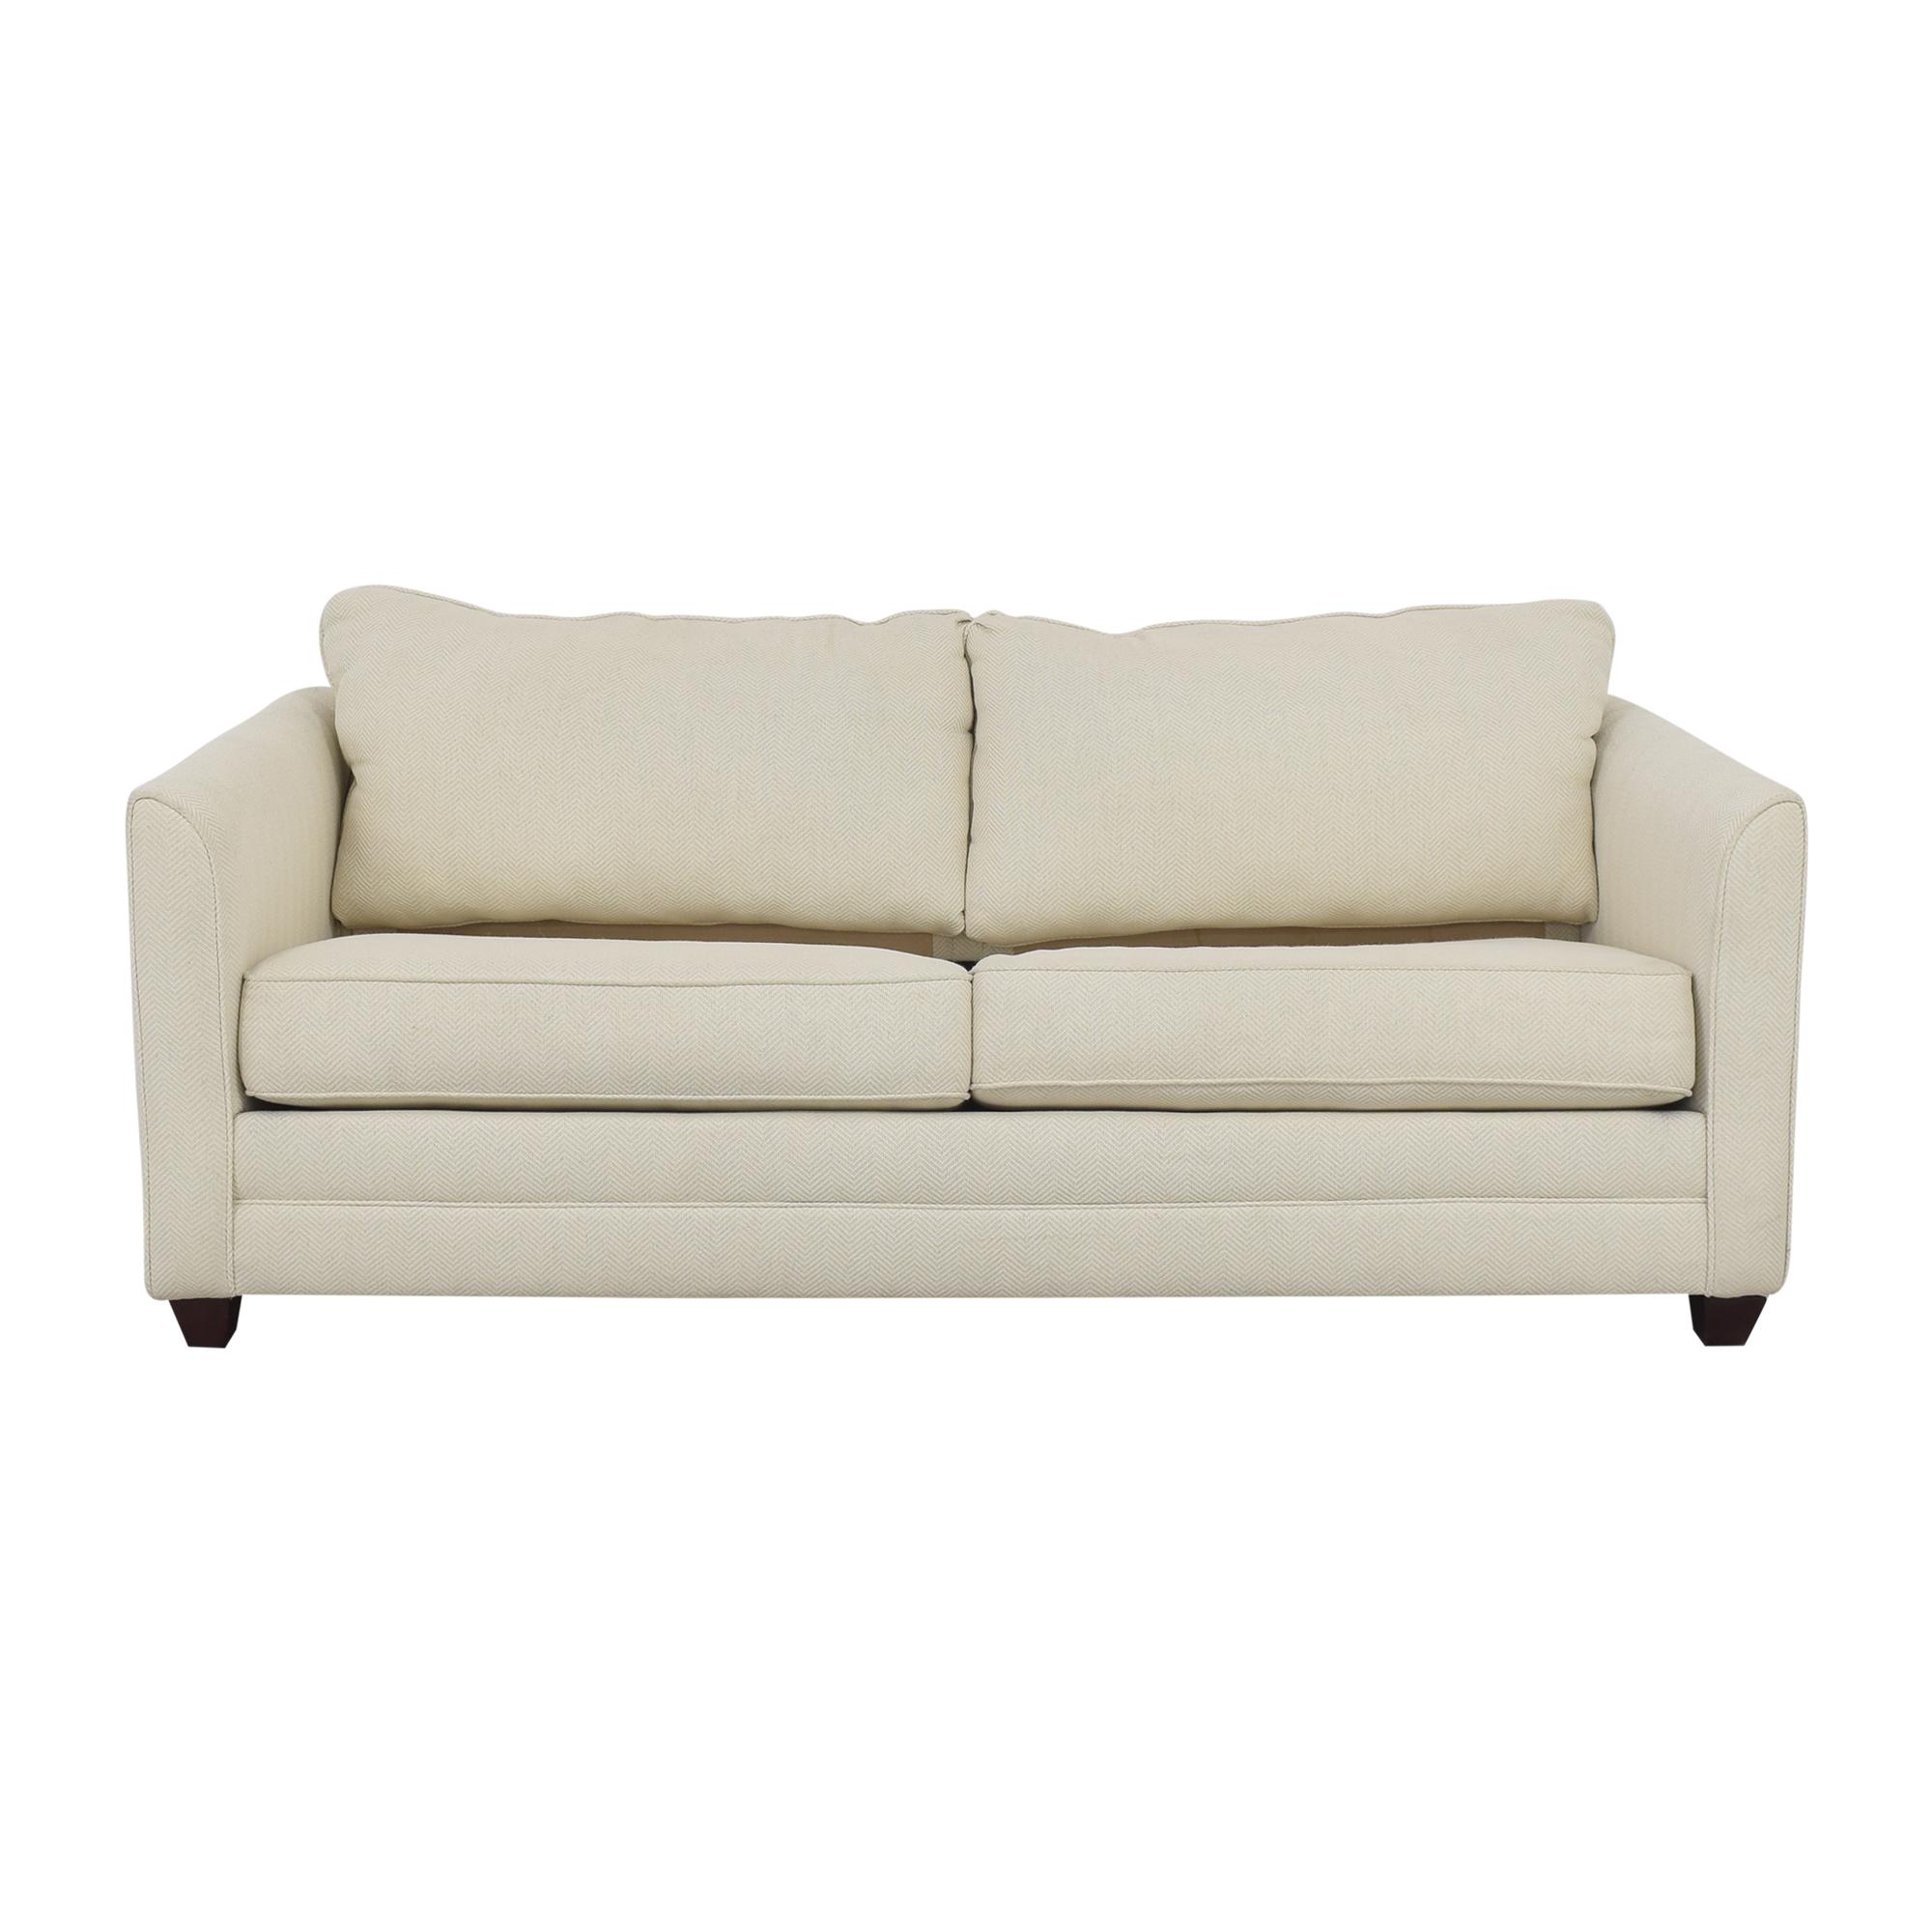 Klaussner Klaussner Tilly Two Cushion Sleeper Sofa nj